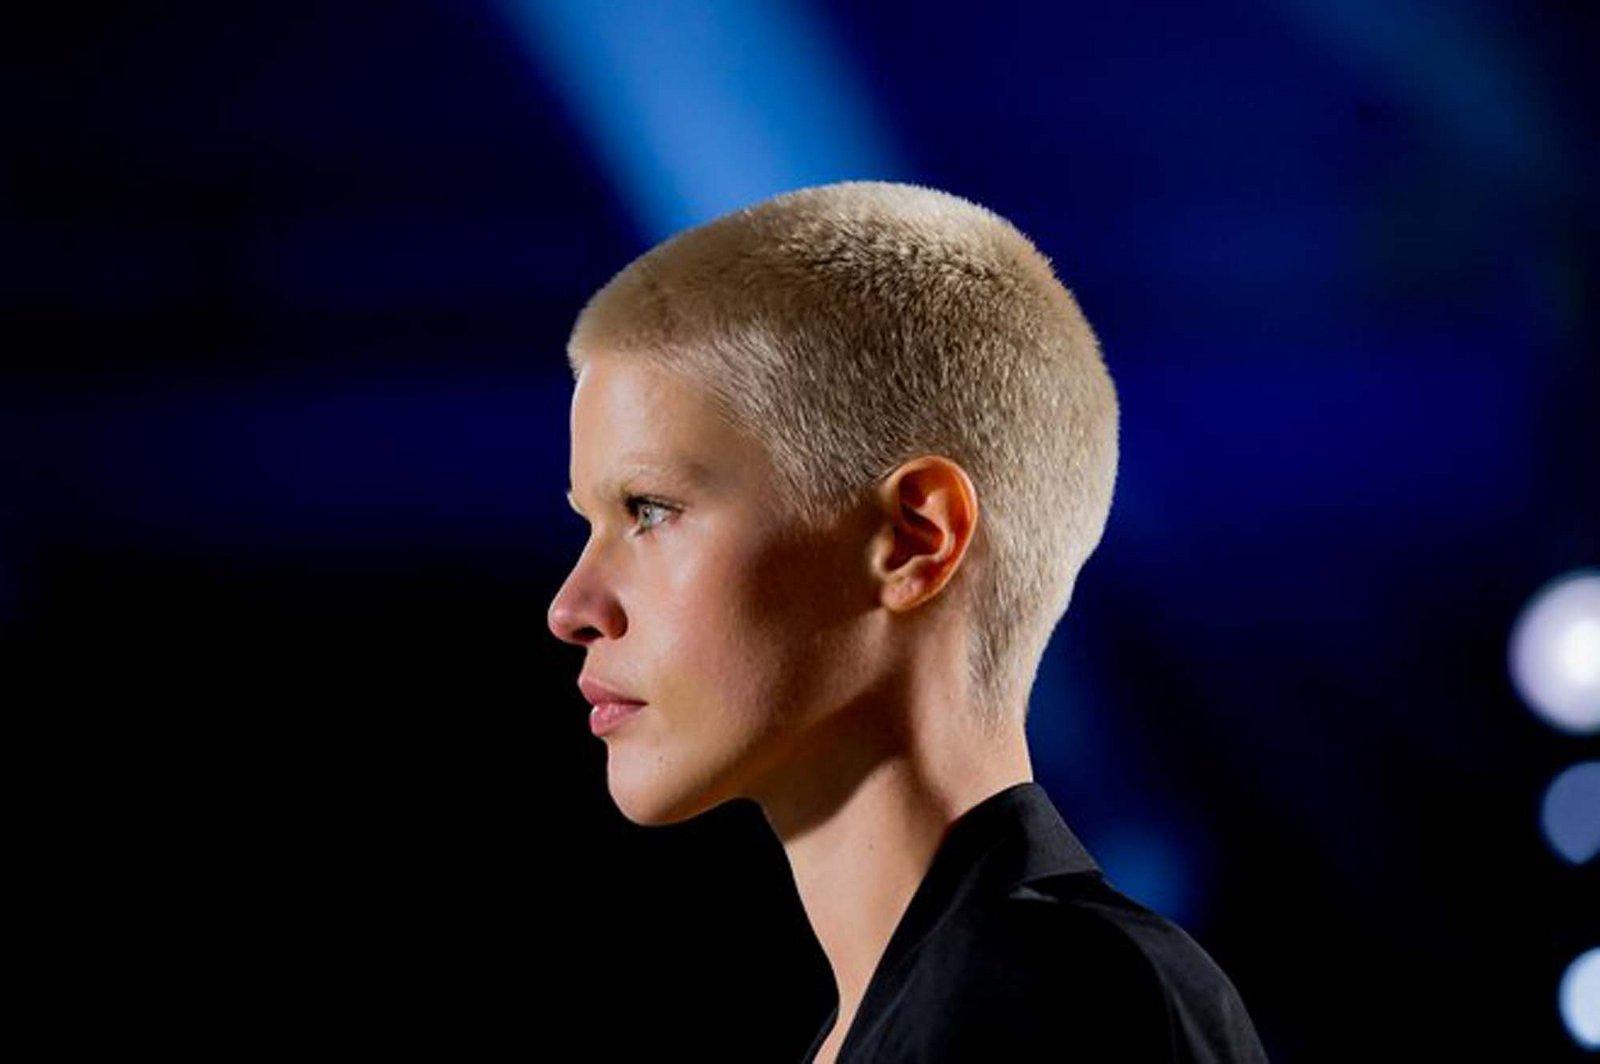 Kris Gottschalk buzz cut hairstyles